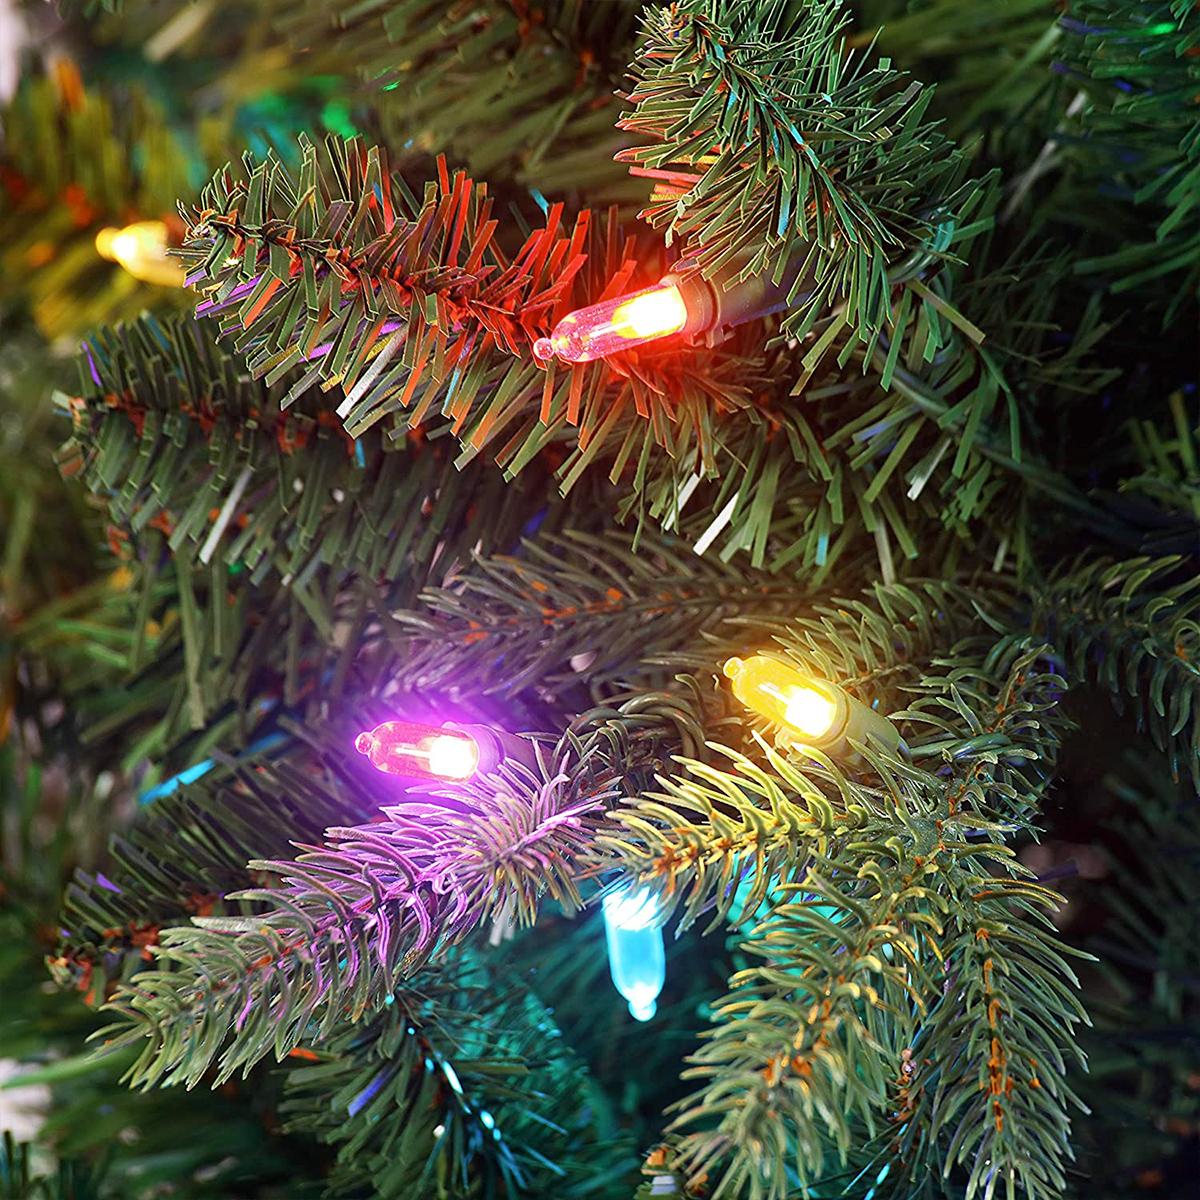 Mr-Christmas-Vermont-Spruce-LED-Smart-Christmas-Tree